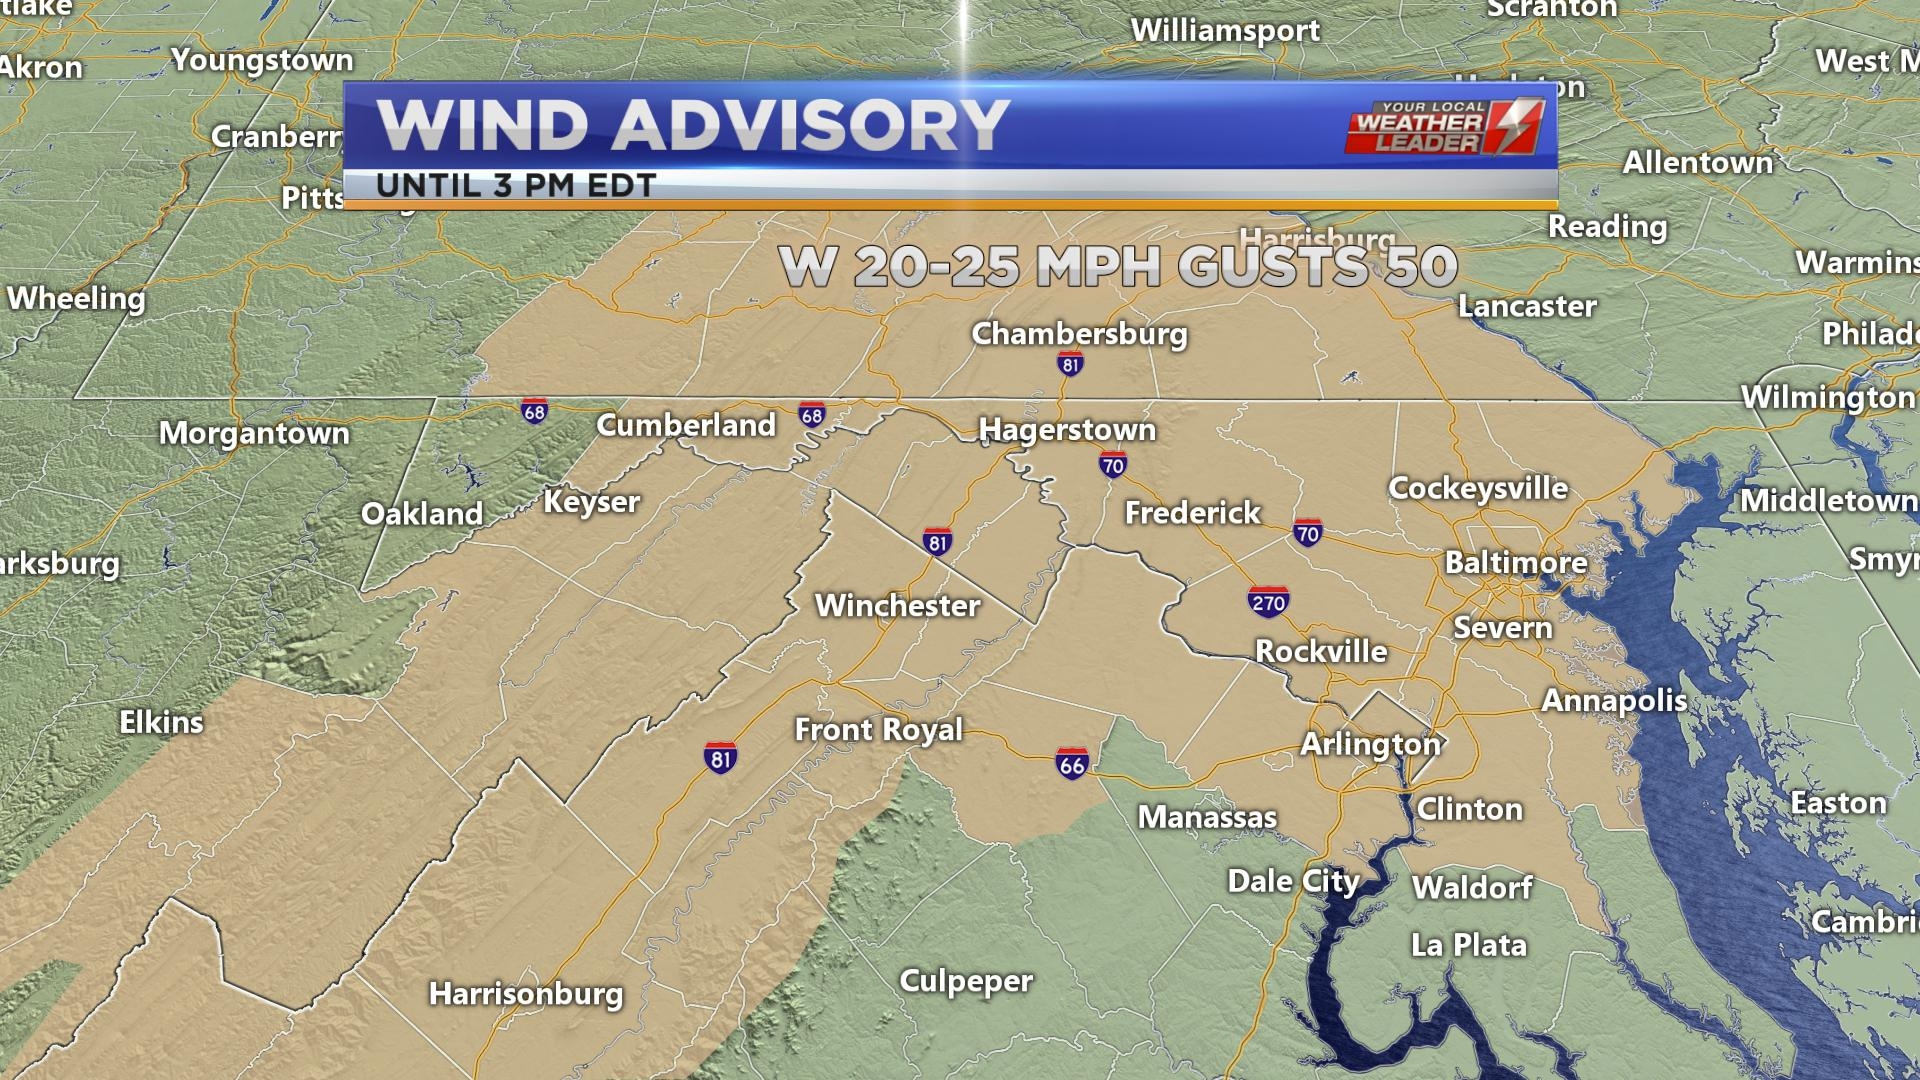 Wind Advisory Saturday 27 April 2019 until 3 PM EDT